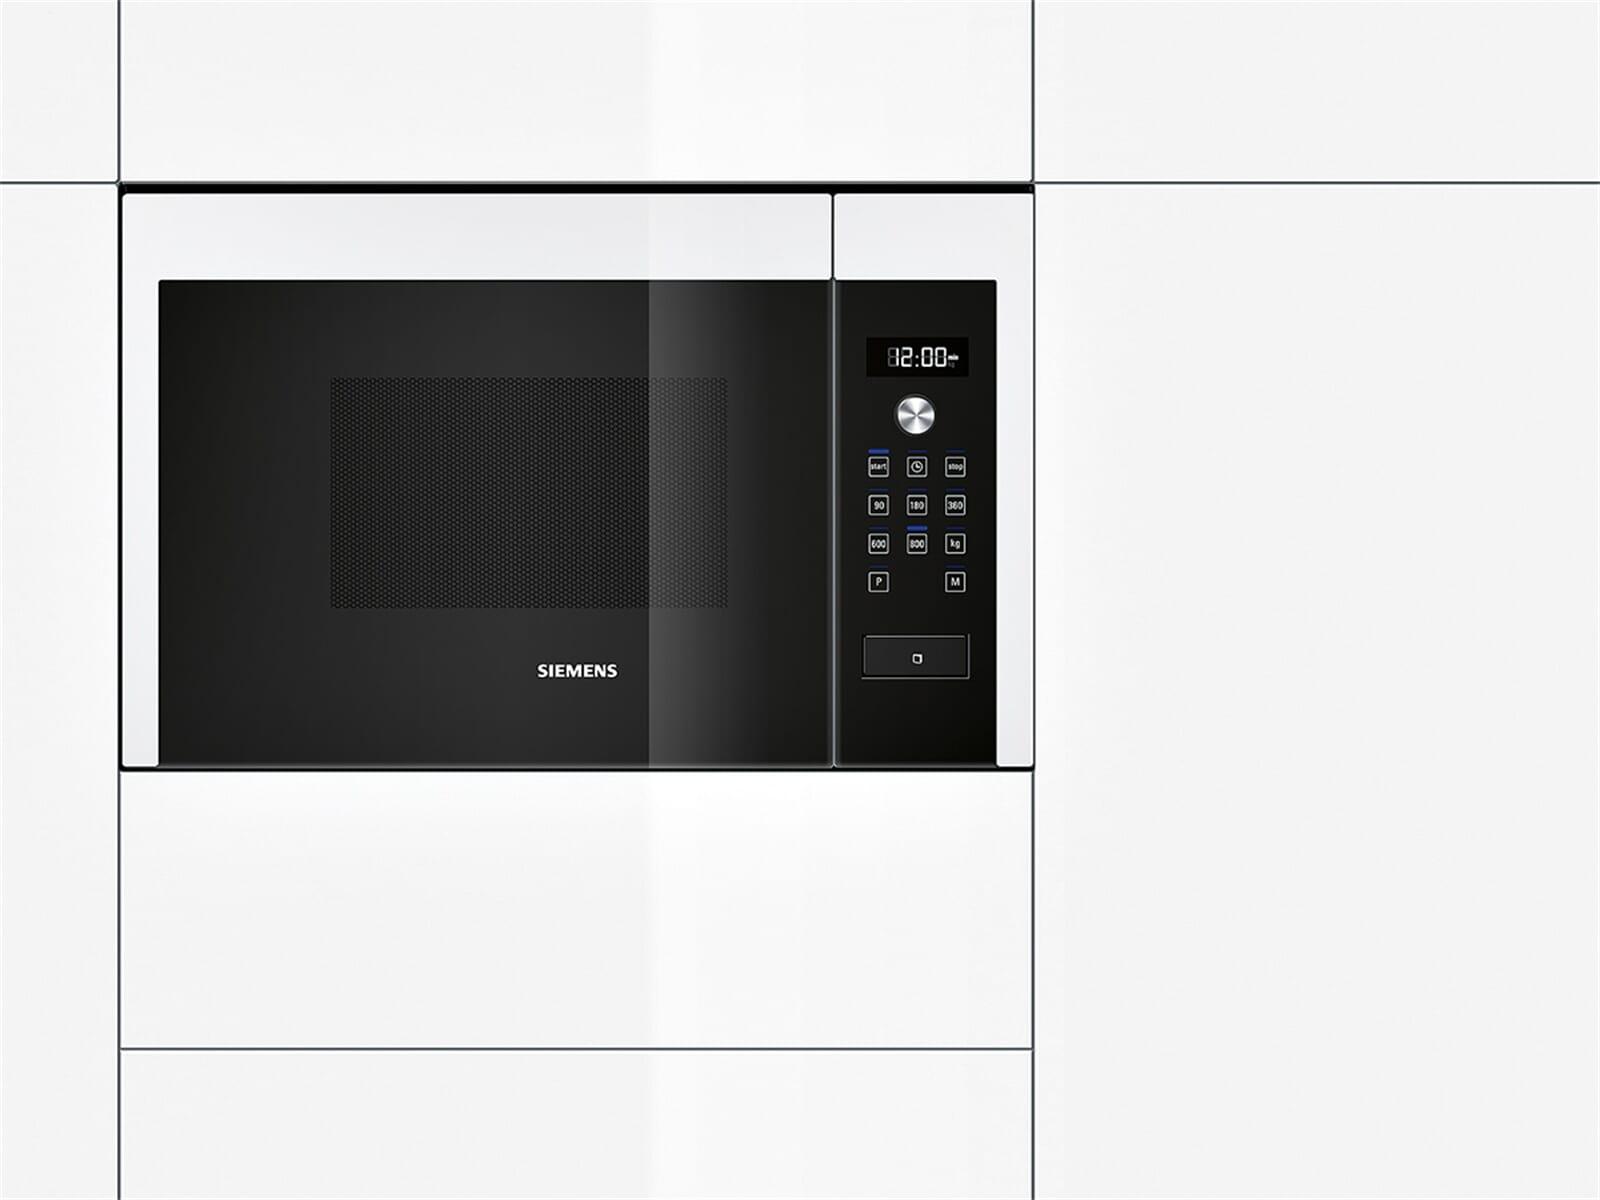 siemens hf15m264 einbau mikrowelle wei mikrowellenofen 900 w. Black Bedroom Furniture Sets. Home Design Ideas